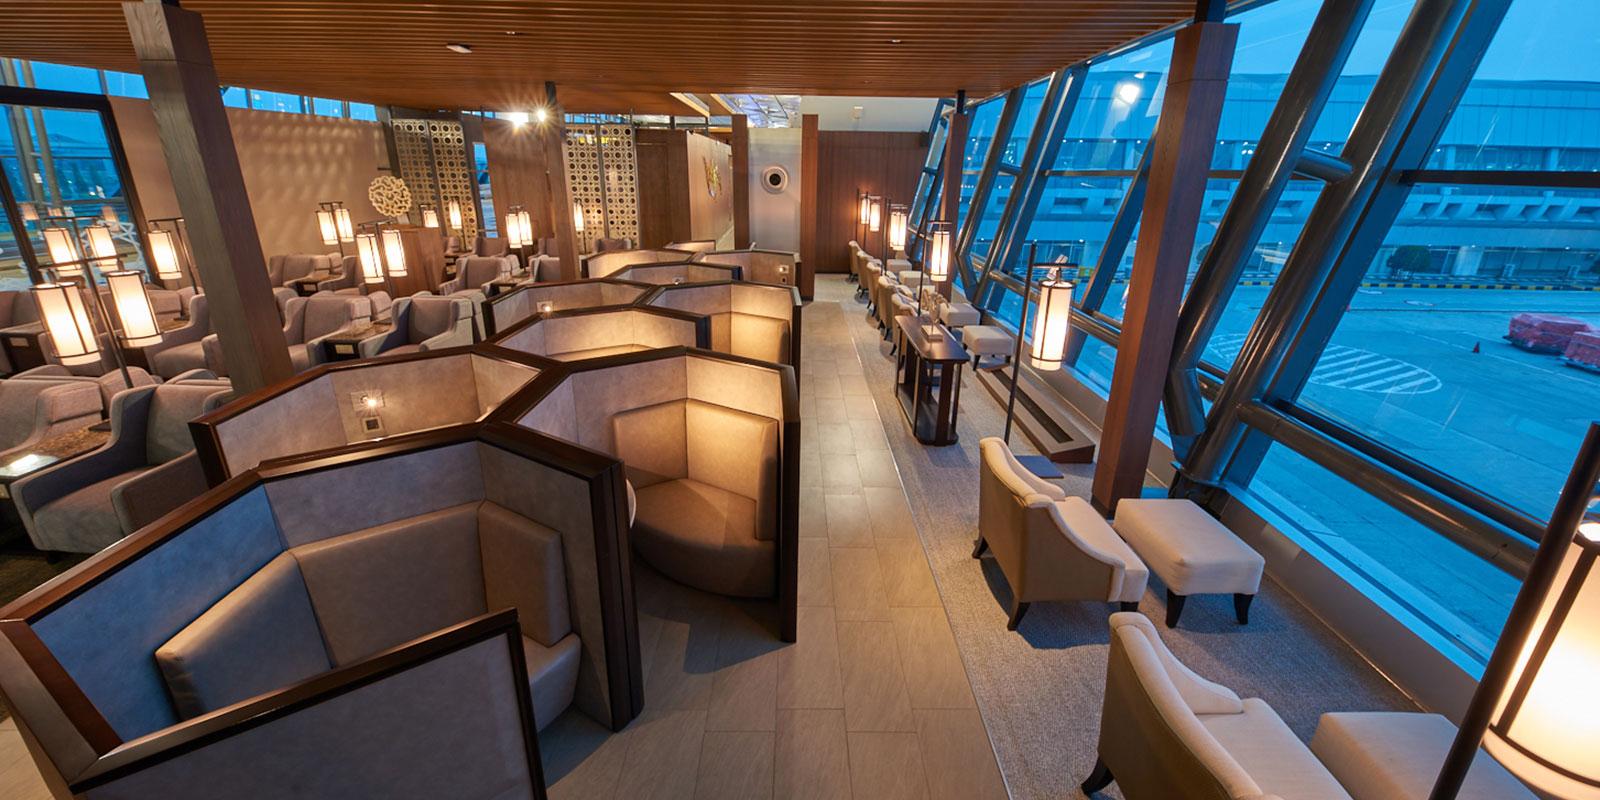 Lounge (Plaza Premium)